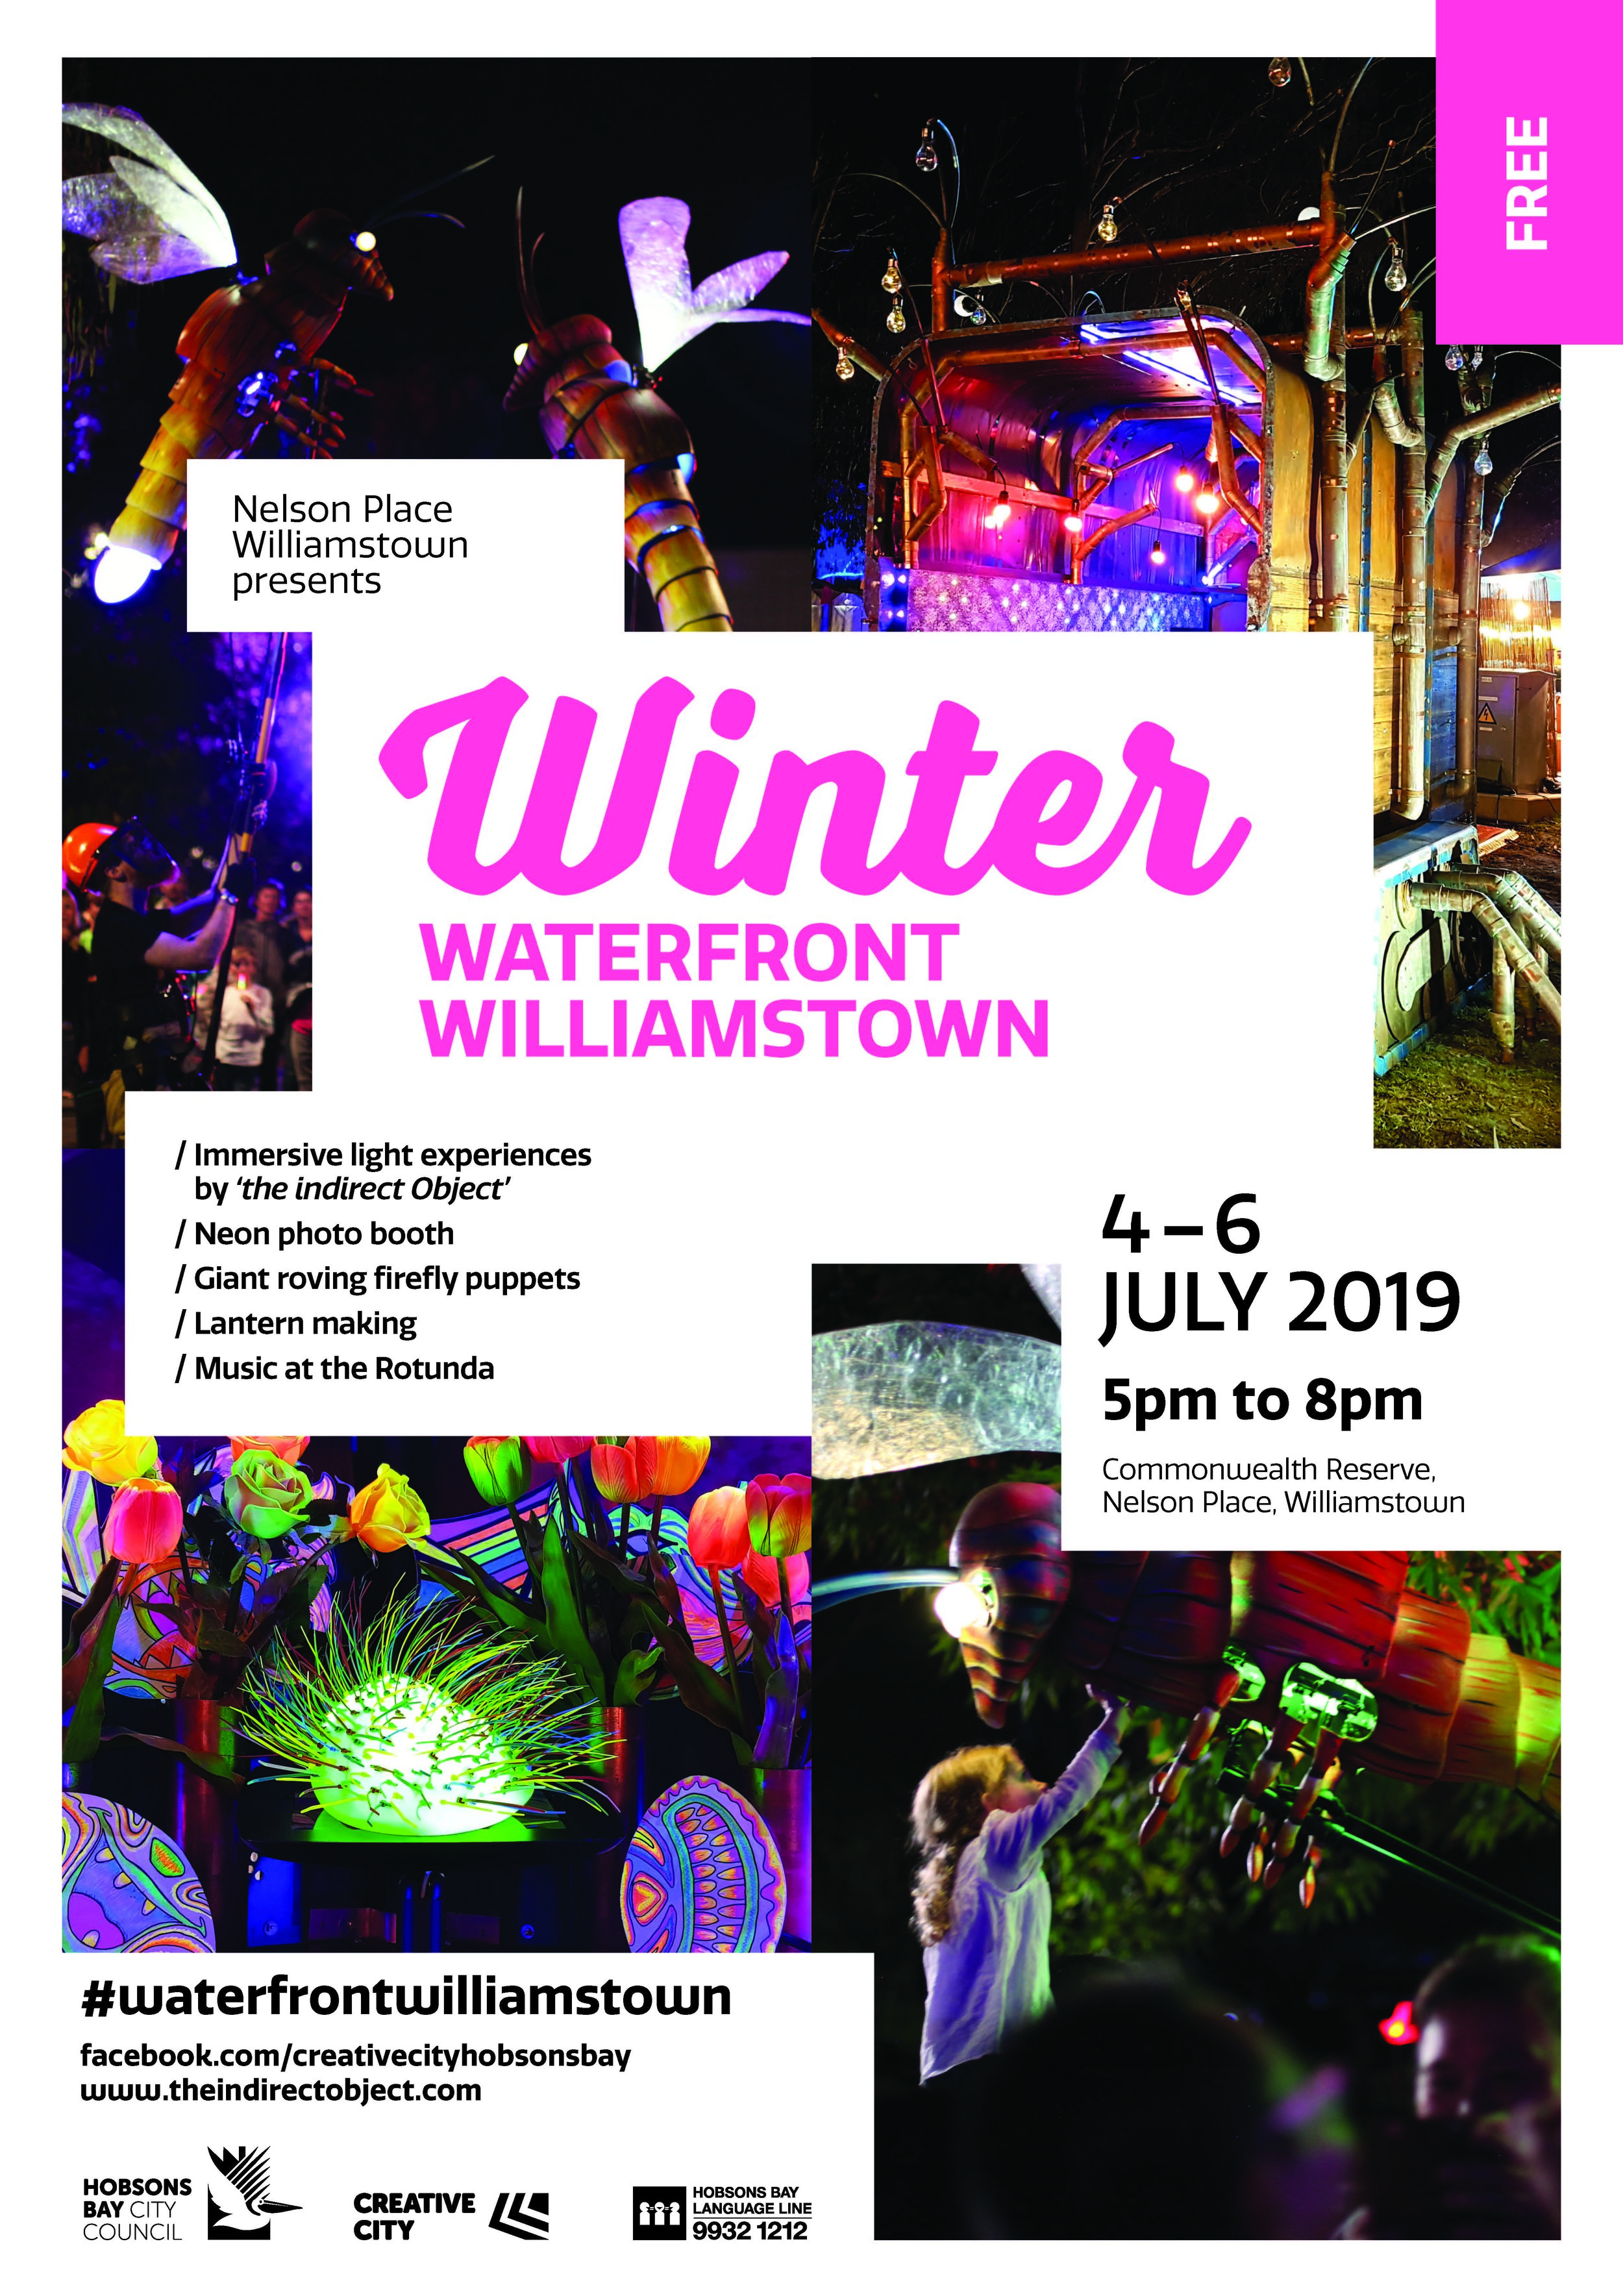 CULTR02824 - WinterWaterfront Williamstown - Poster A3 - JPEG (A3112993).jpg